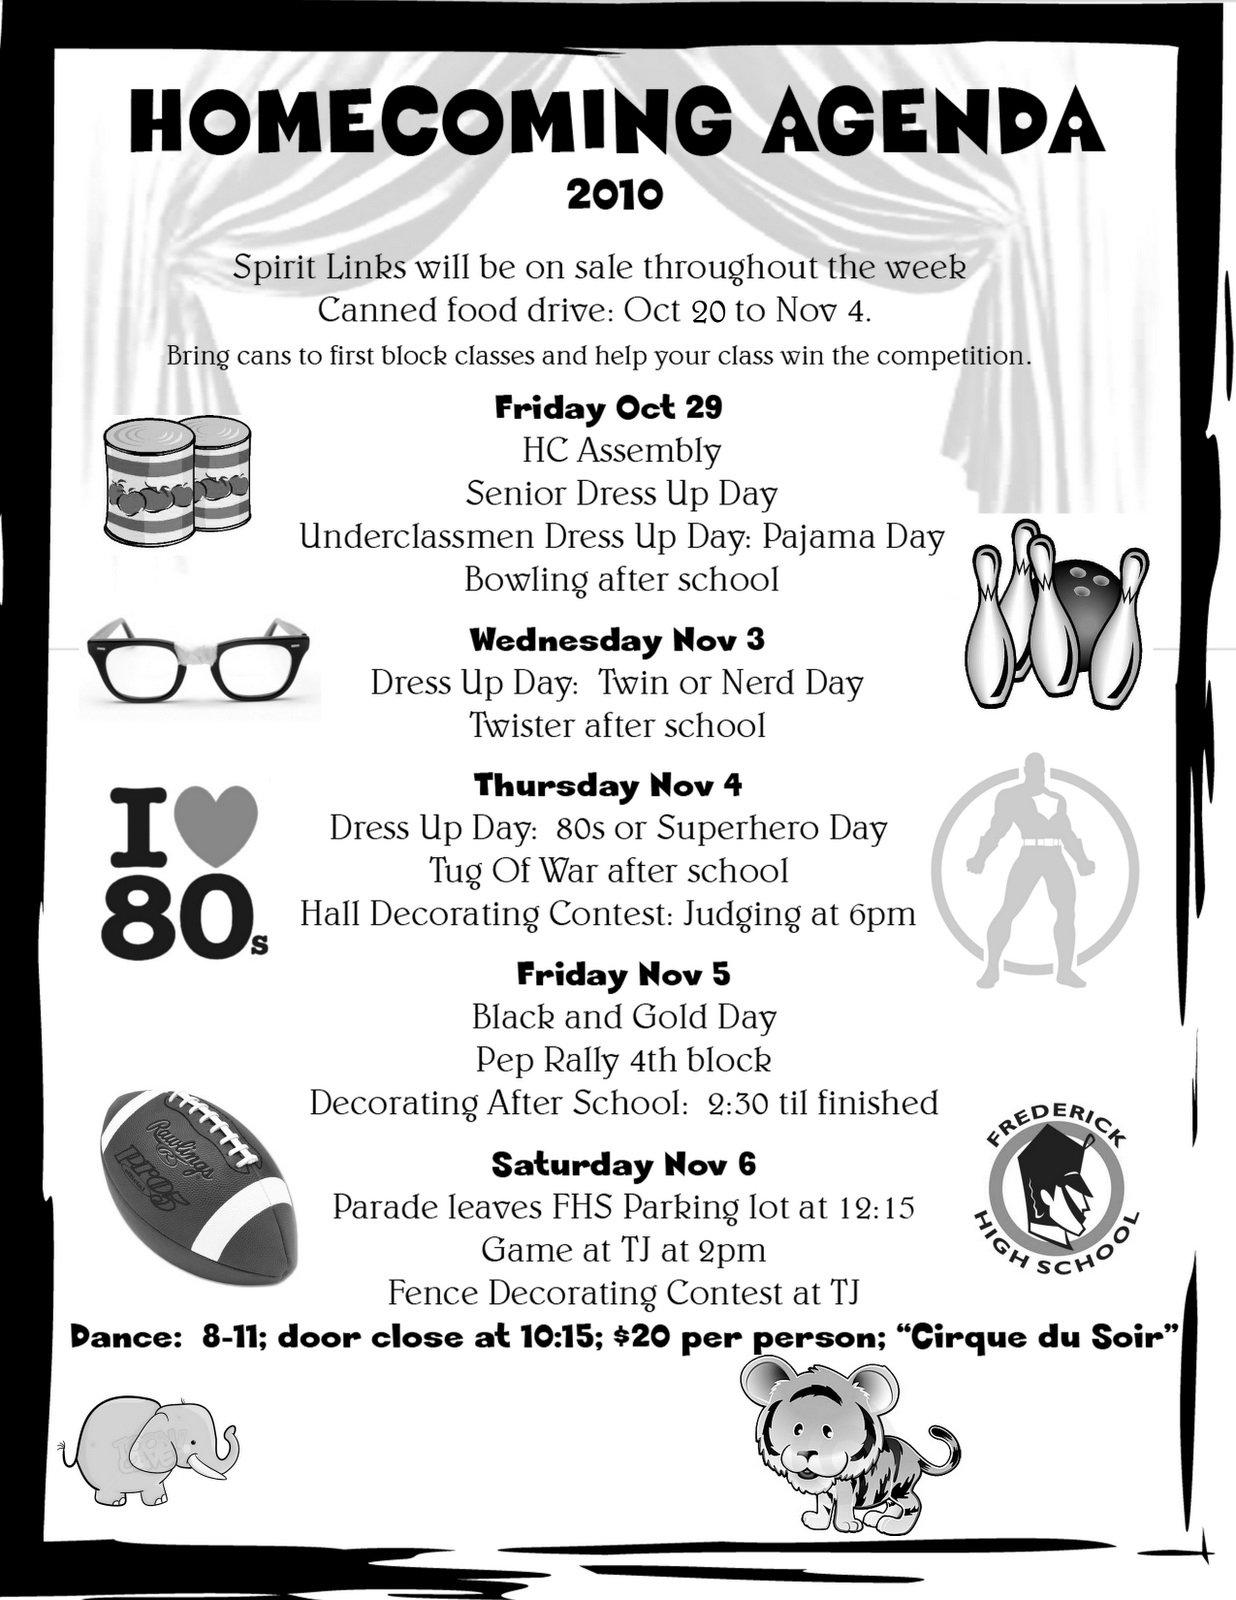 10 Best High School Homecoming Theme Ideas homecoming week spirit days student council ideas pinterest 16 2020